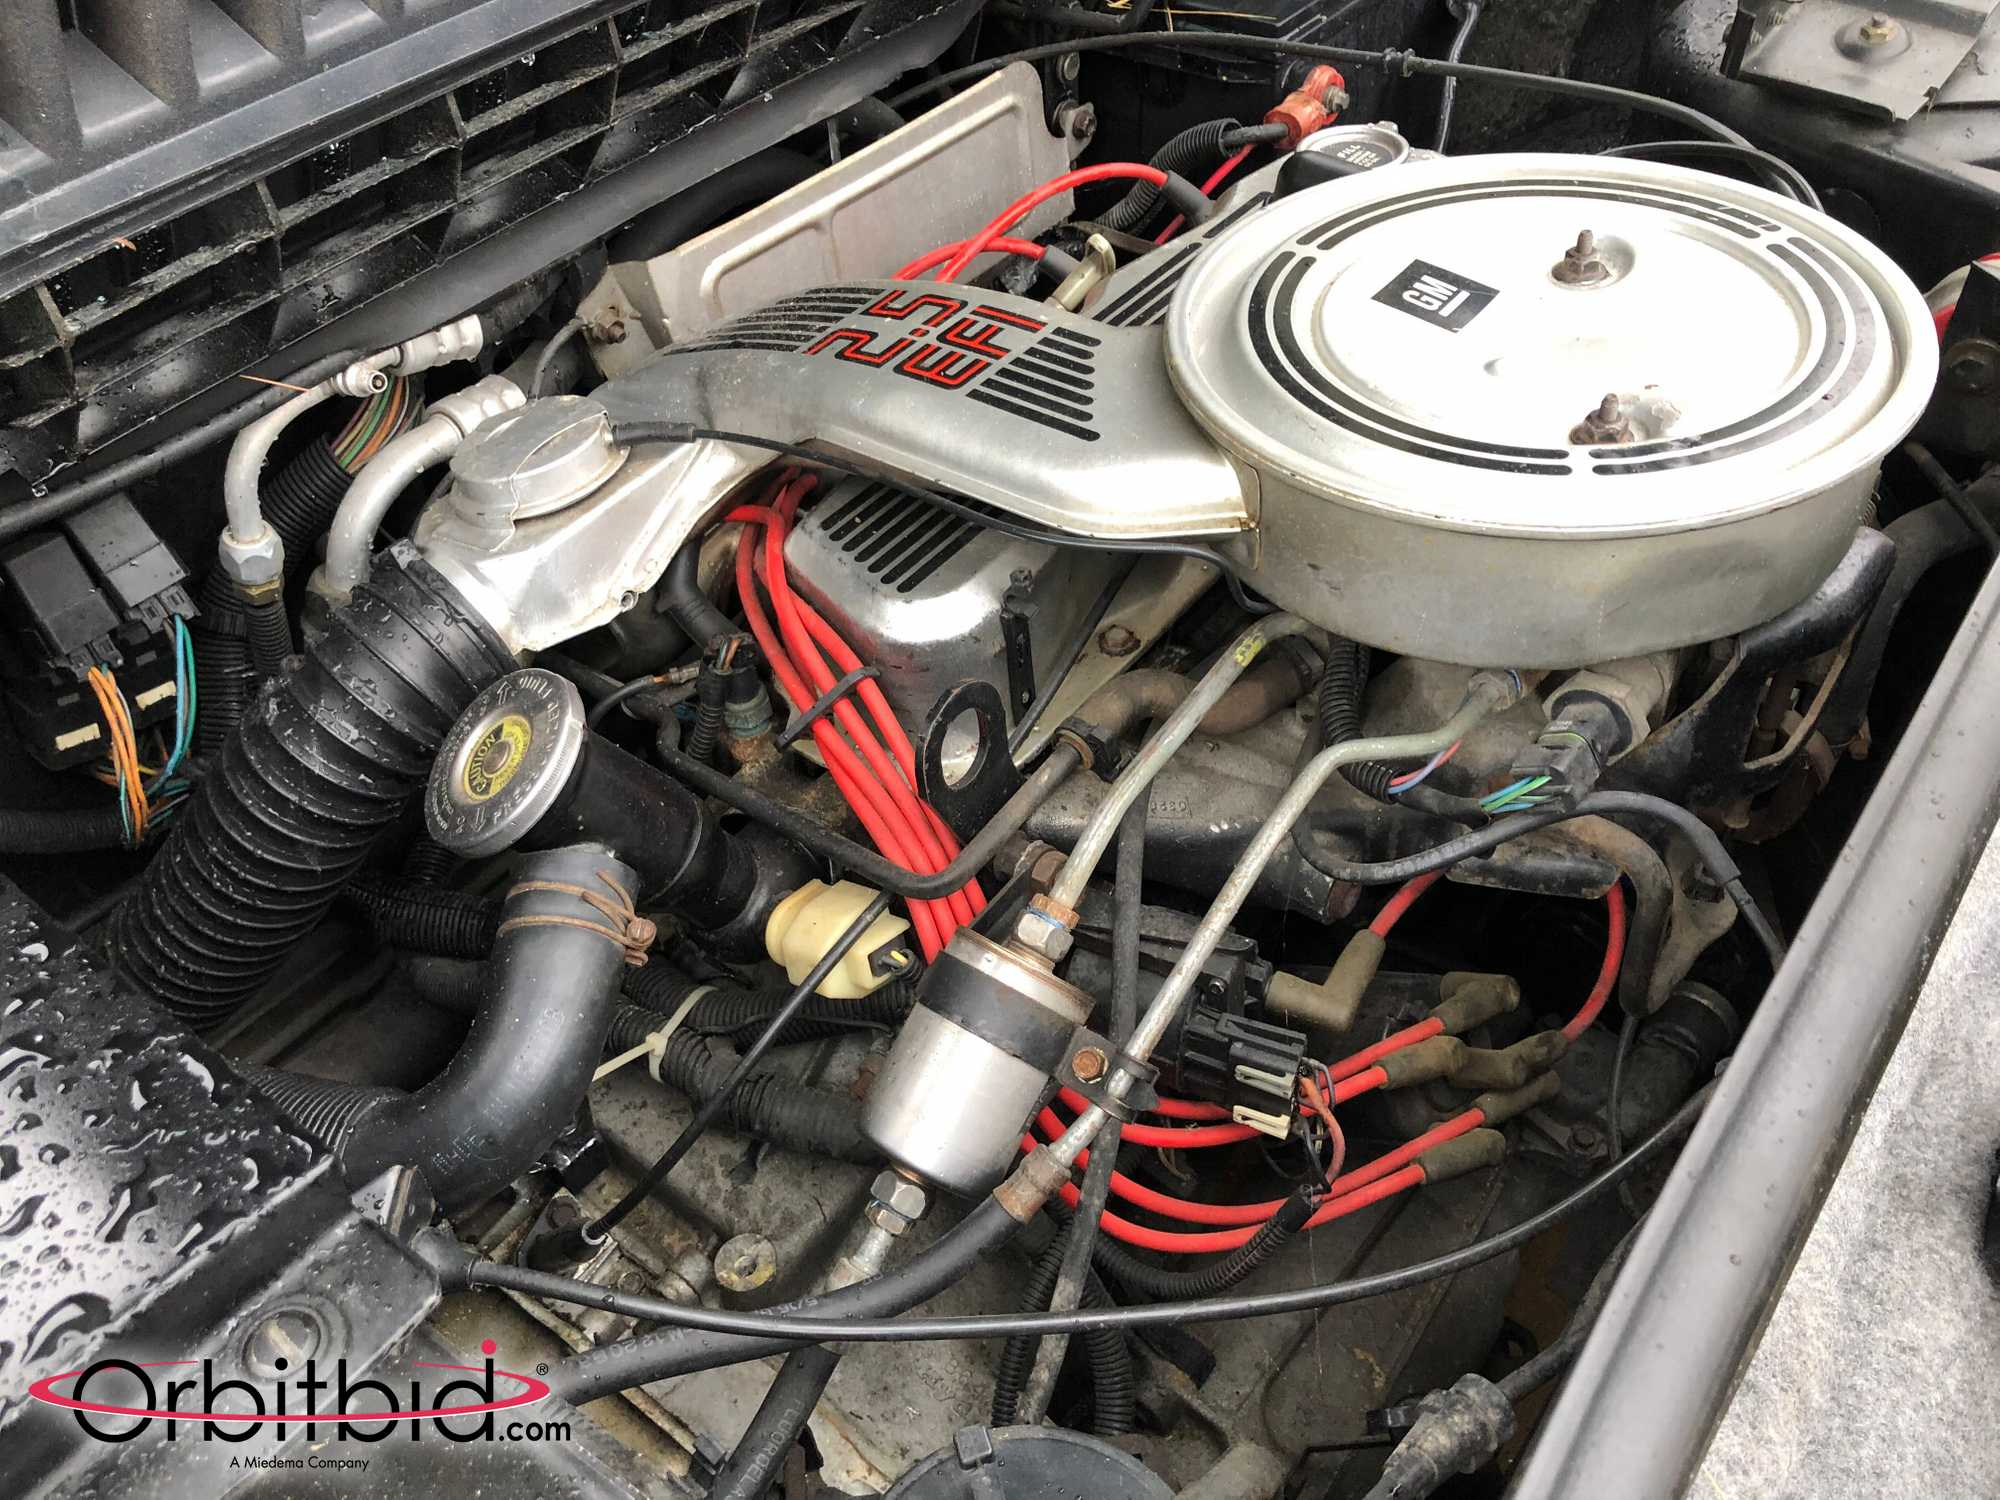 1984 Fiero Pace Car Engine